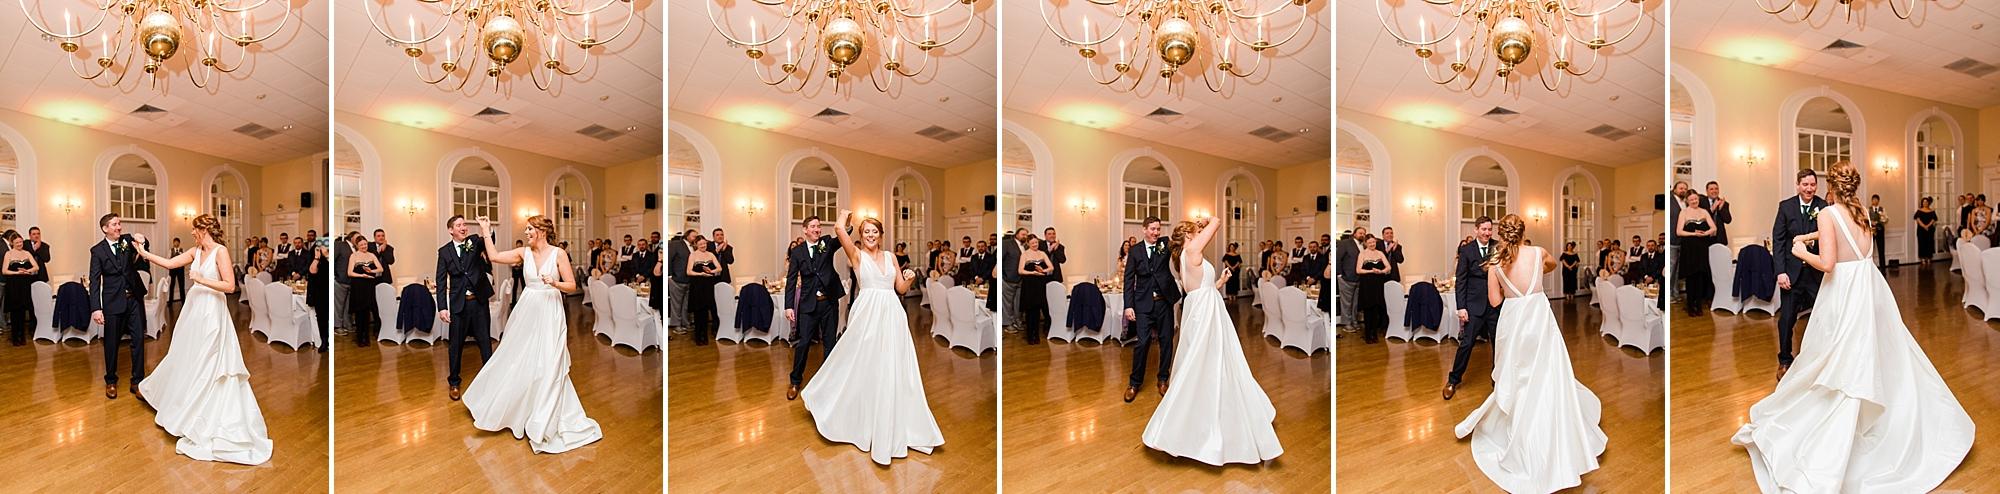 eisleyimages-irish-wedding-boston-seaport_0097.jpg